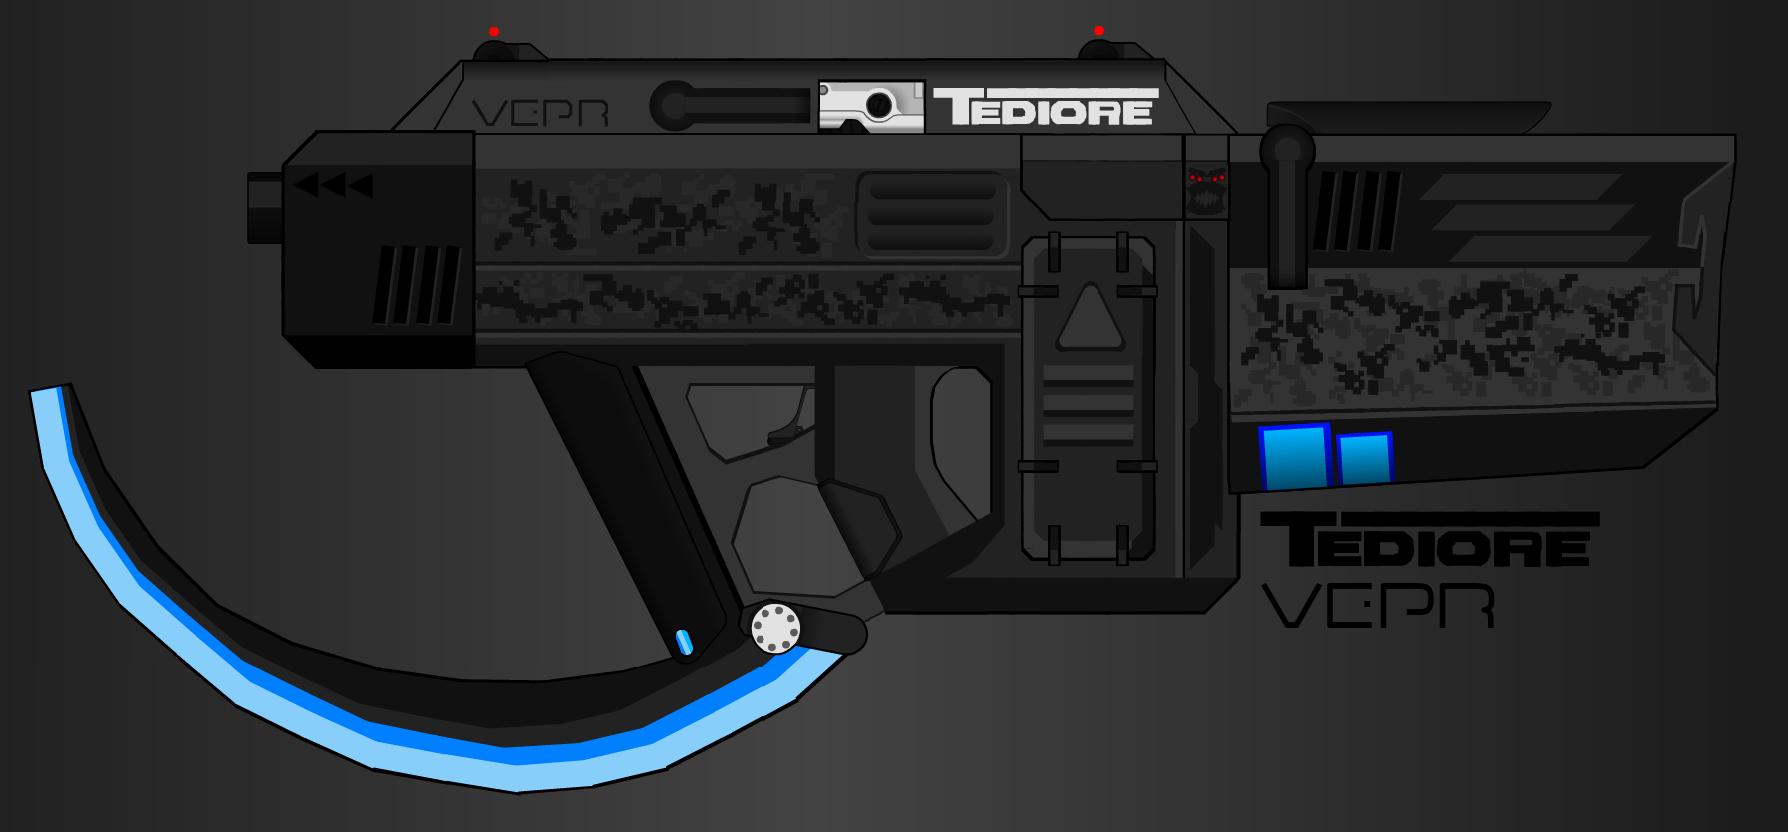 "Pimp My Gun Tediore - Urban Discus SMG. Tediore® Corporation/Vepr - SMG-12 Submachinegun ""Urban Discus"" -------------------- I think it looks pretty T pimp my gun"